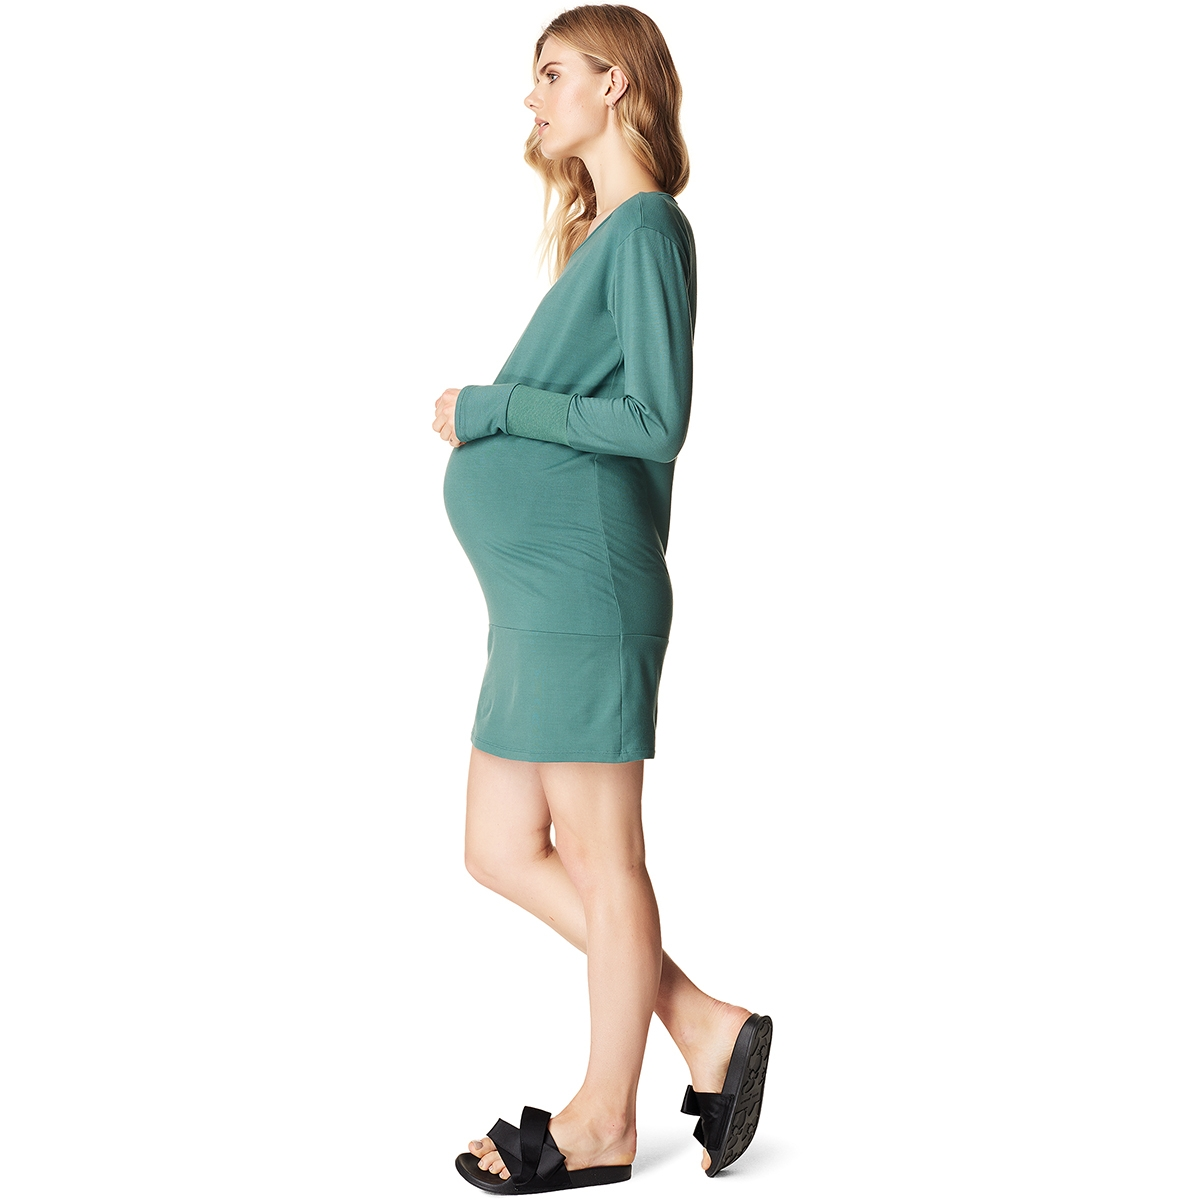 s0704 dress sweat supermom positie jurk green